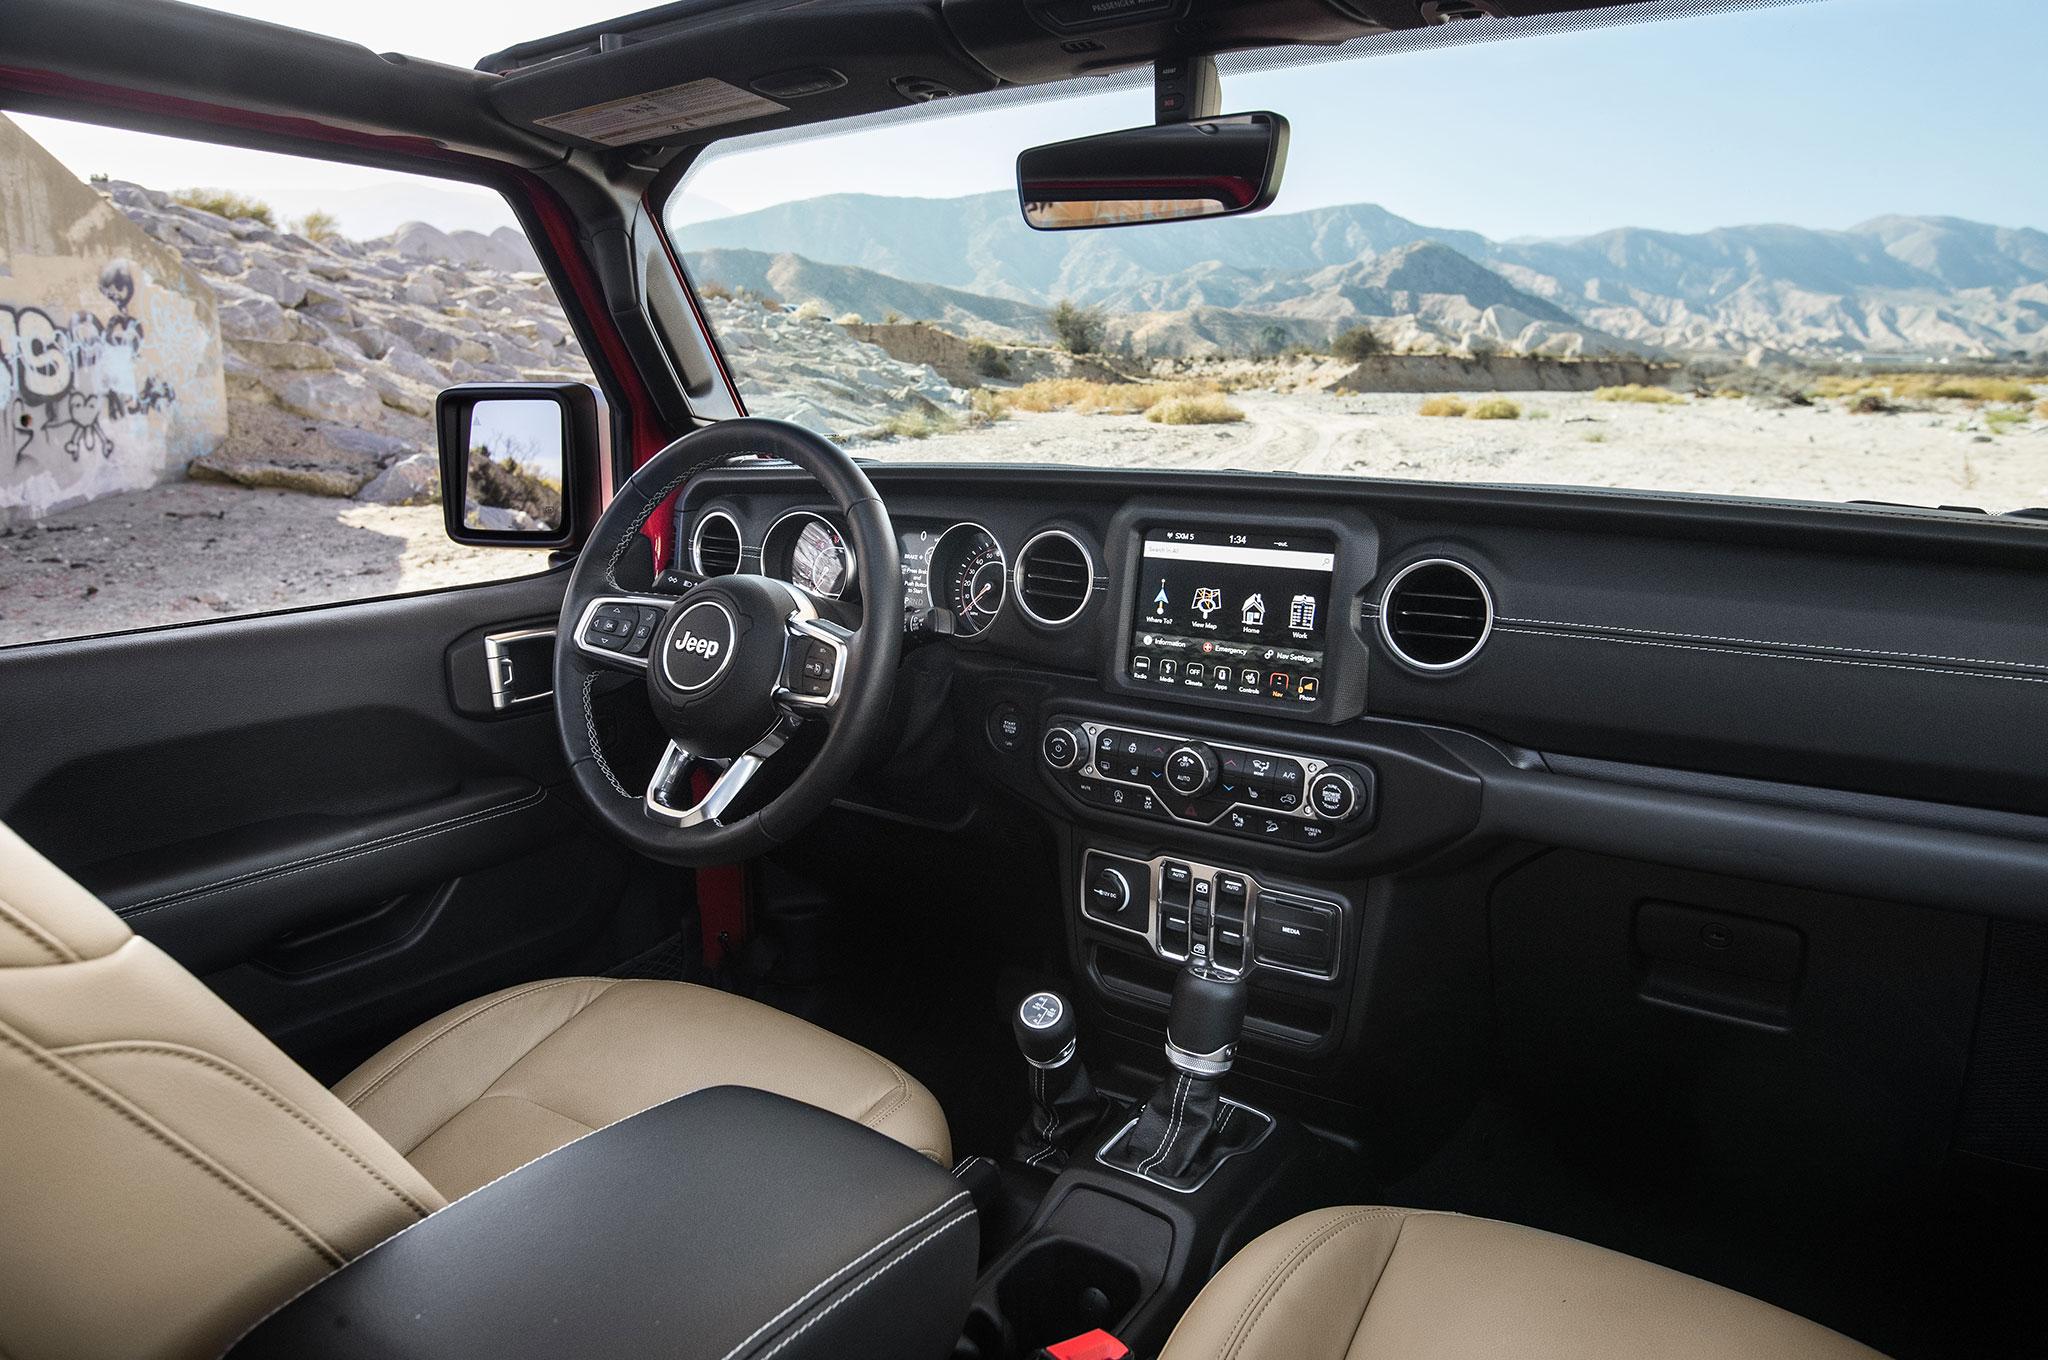 2018 Jeep Wrangler Sahara Unlimited interior from ...